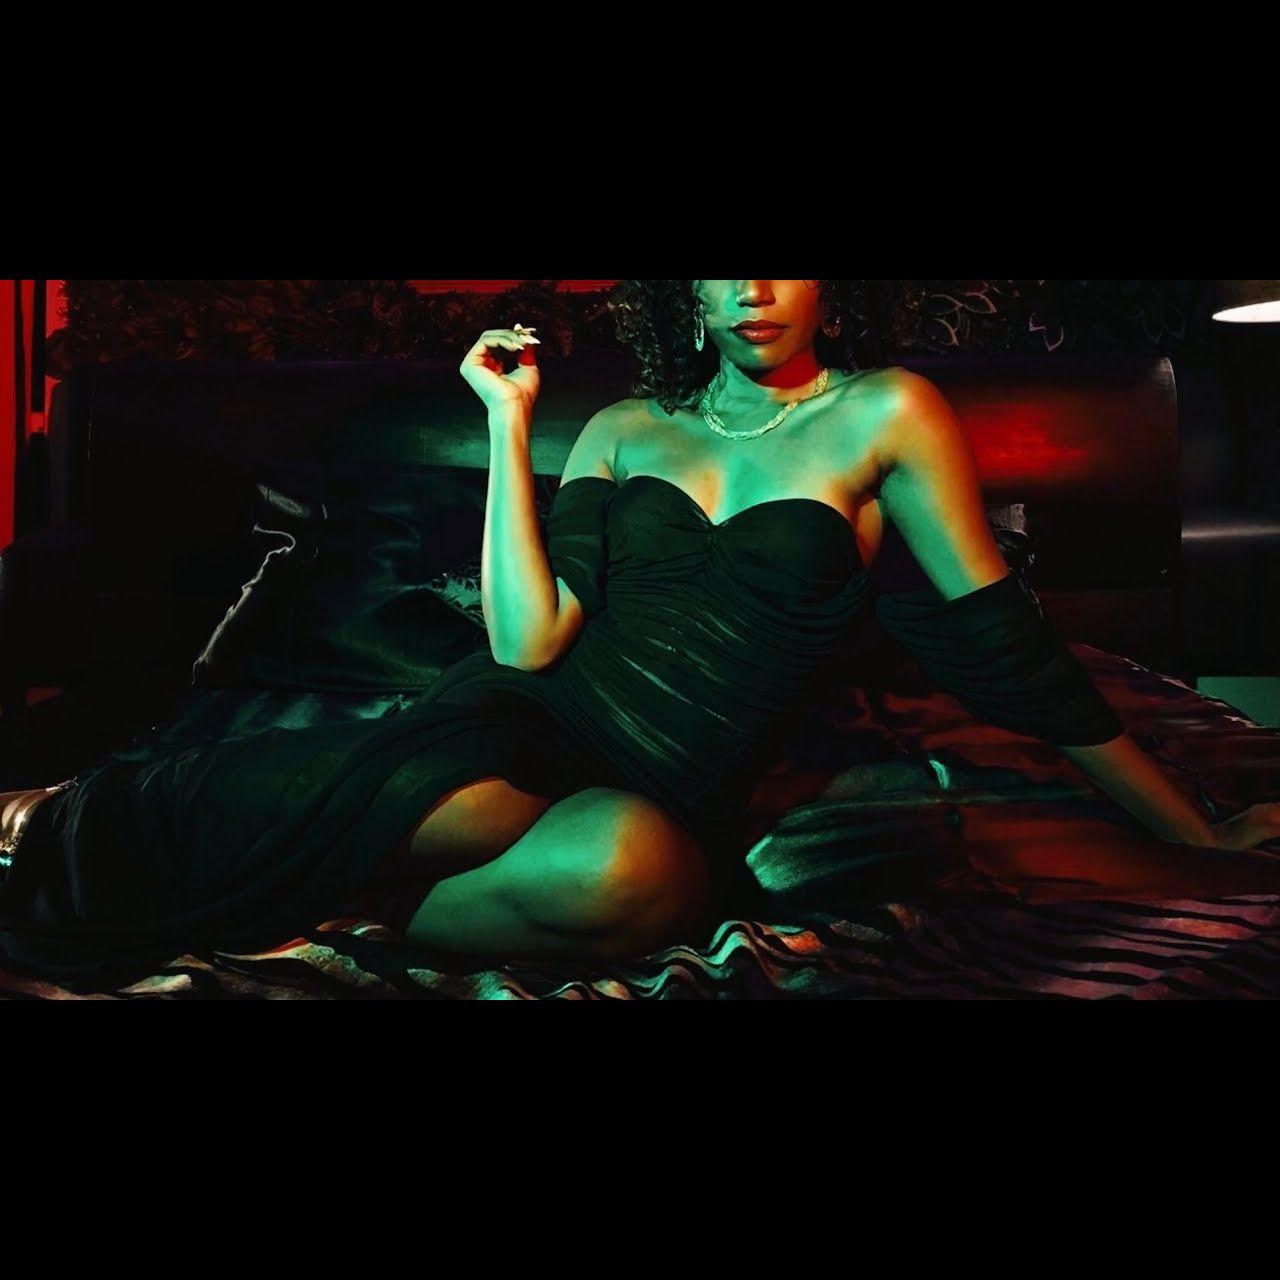 Shanel Hill - Pèd la tèt (ft. Keros-N) (Thumbnail)